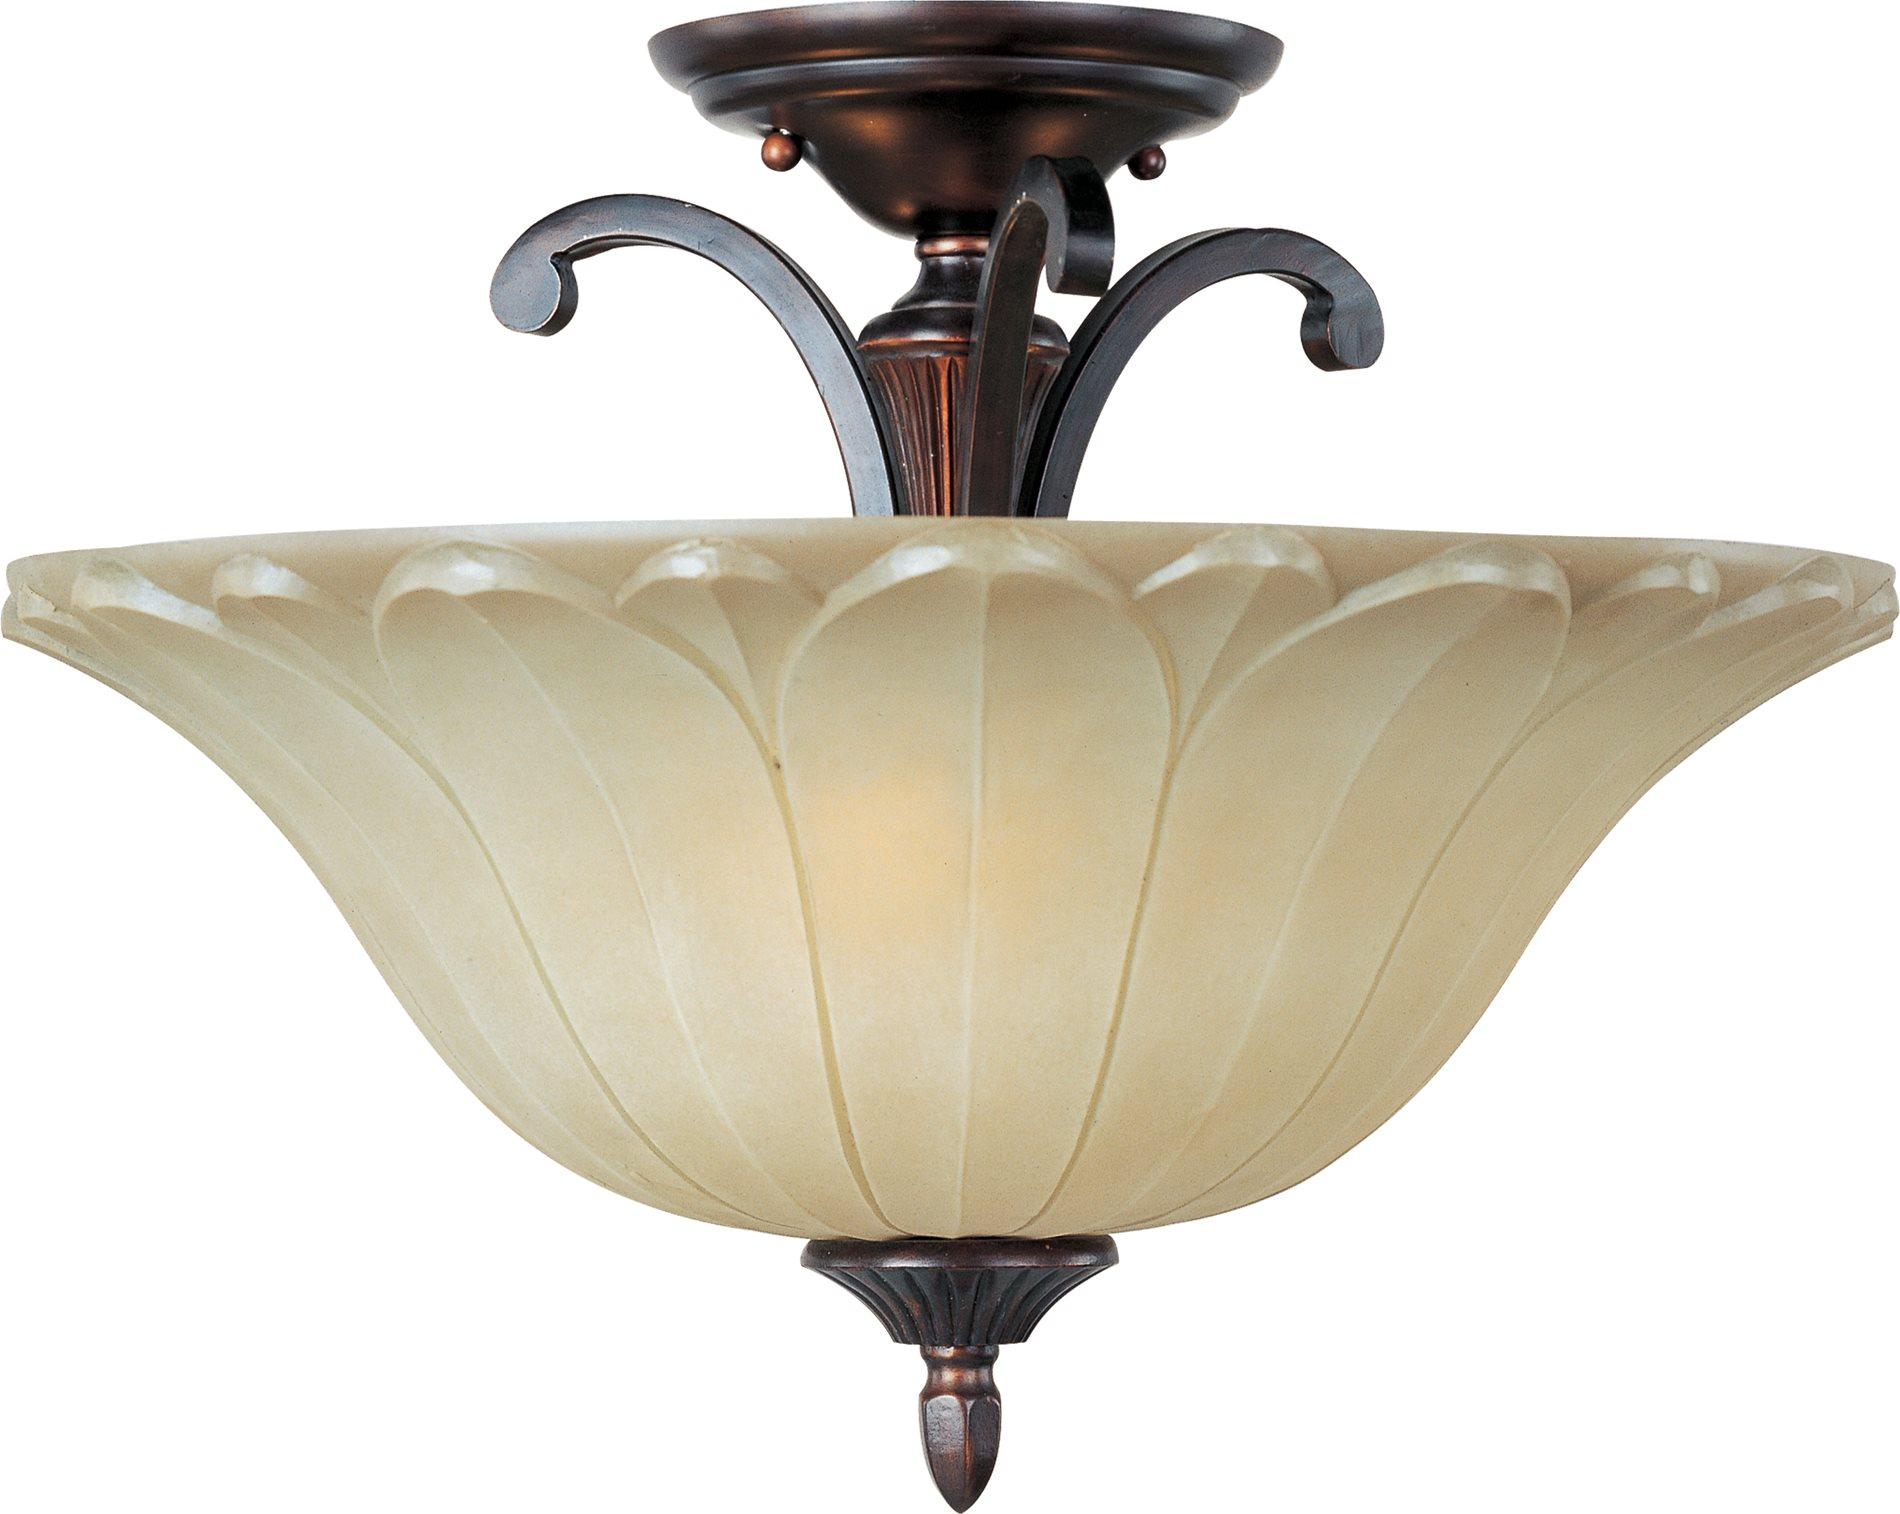 Semi Flush Ceiling Lights Glass Brass Fixture Bathroom: Maxim Lighting 13501WSOI Allentown Traditional Semi Flush